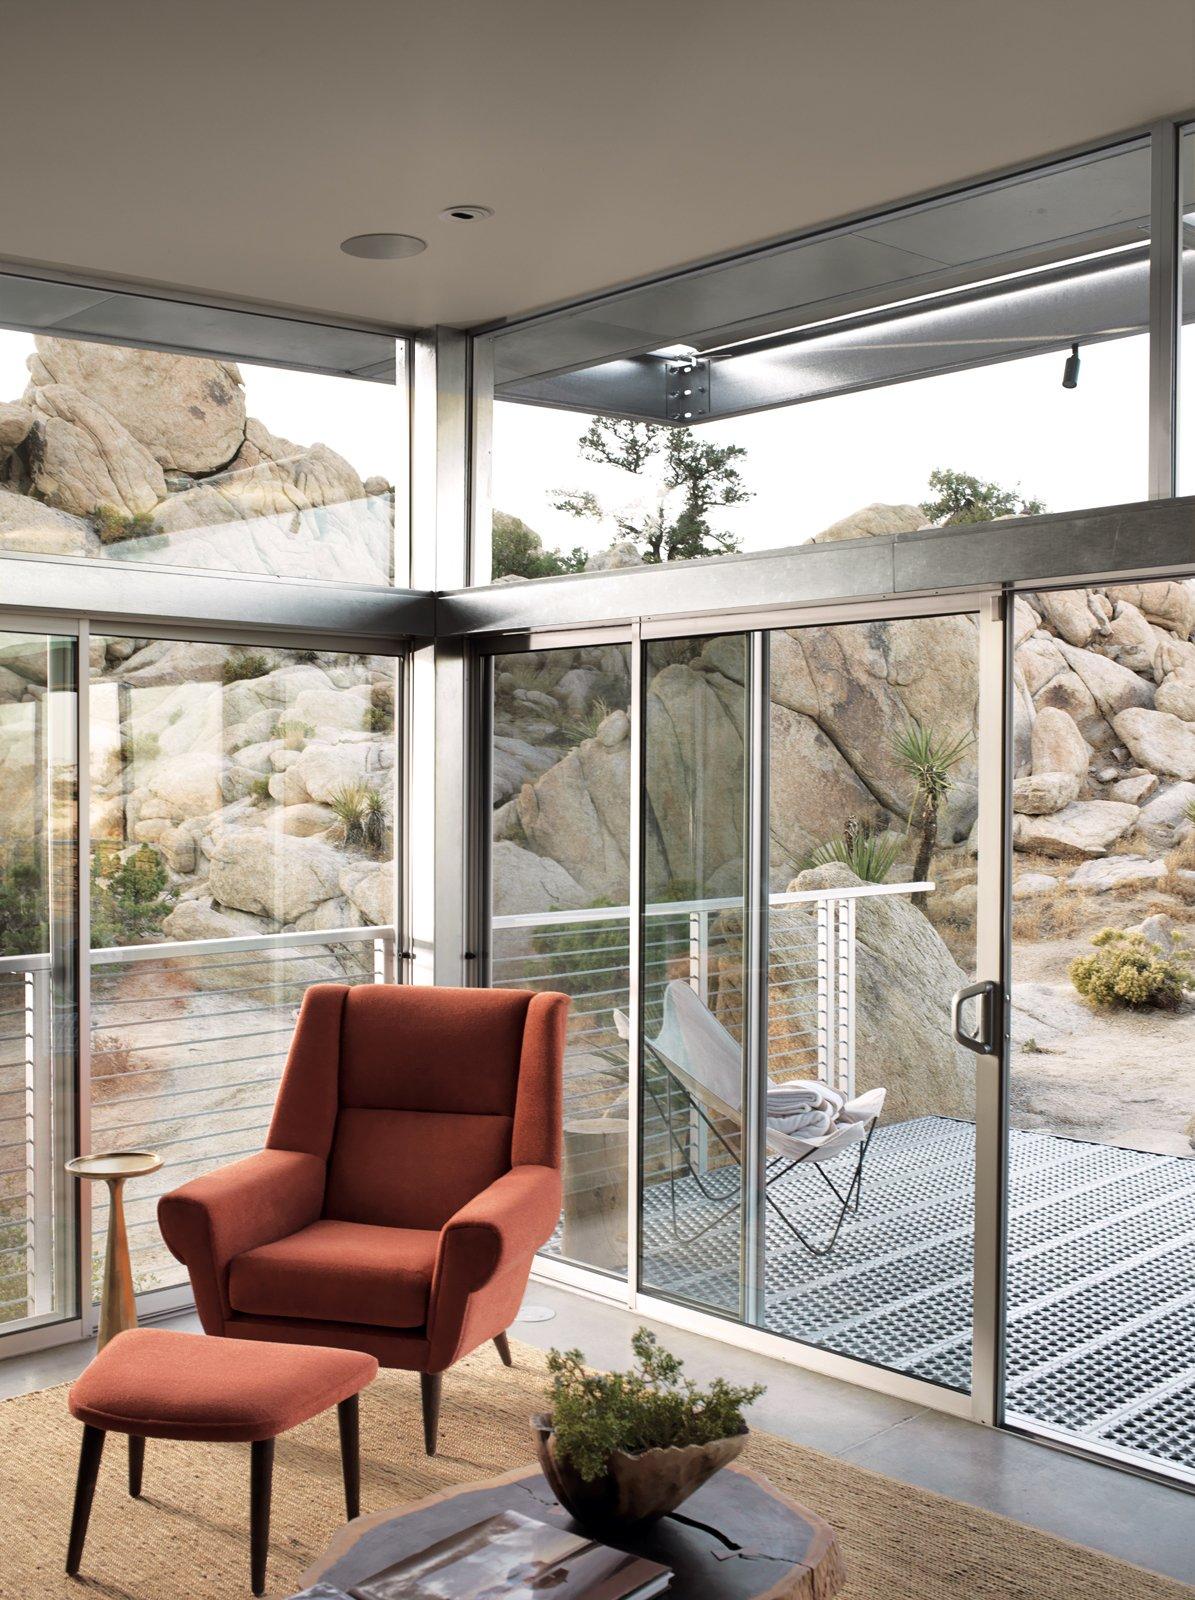 #seatingdesign #interior #inside #indoor #window #glass #landscape #PalmSprings #DavidChair #ottoman #ChristopherKennedy #California #green #ecofriendly  100+ Best Modern Seating Designs